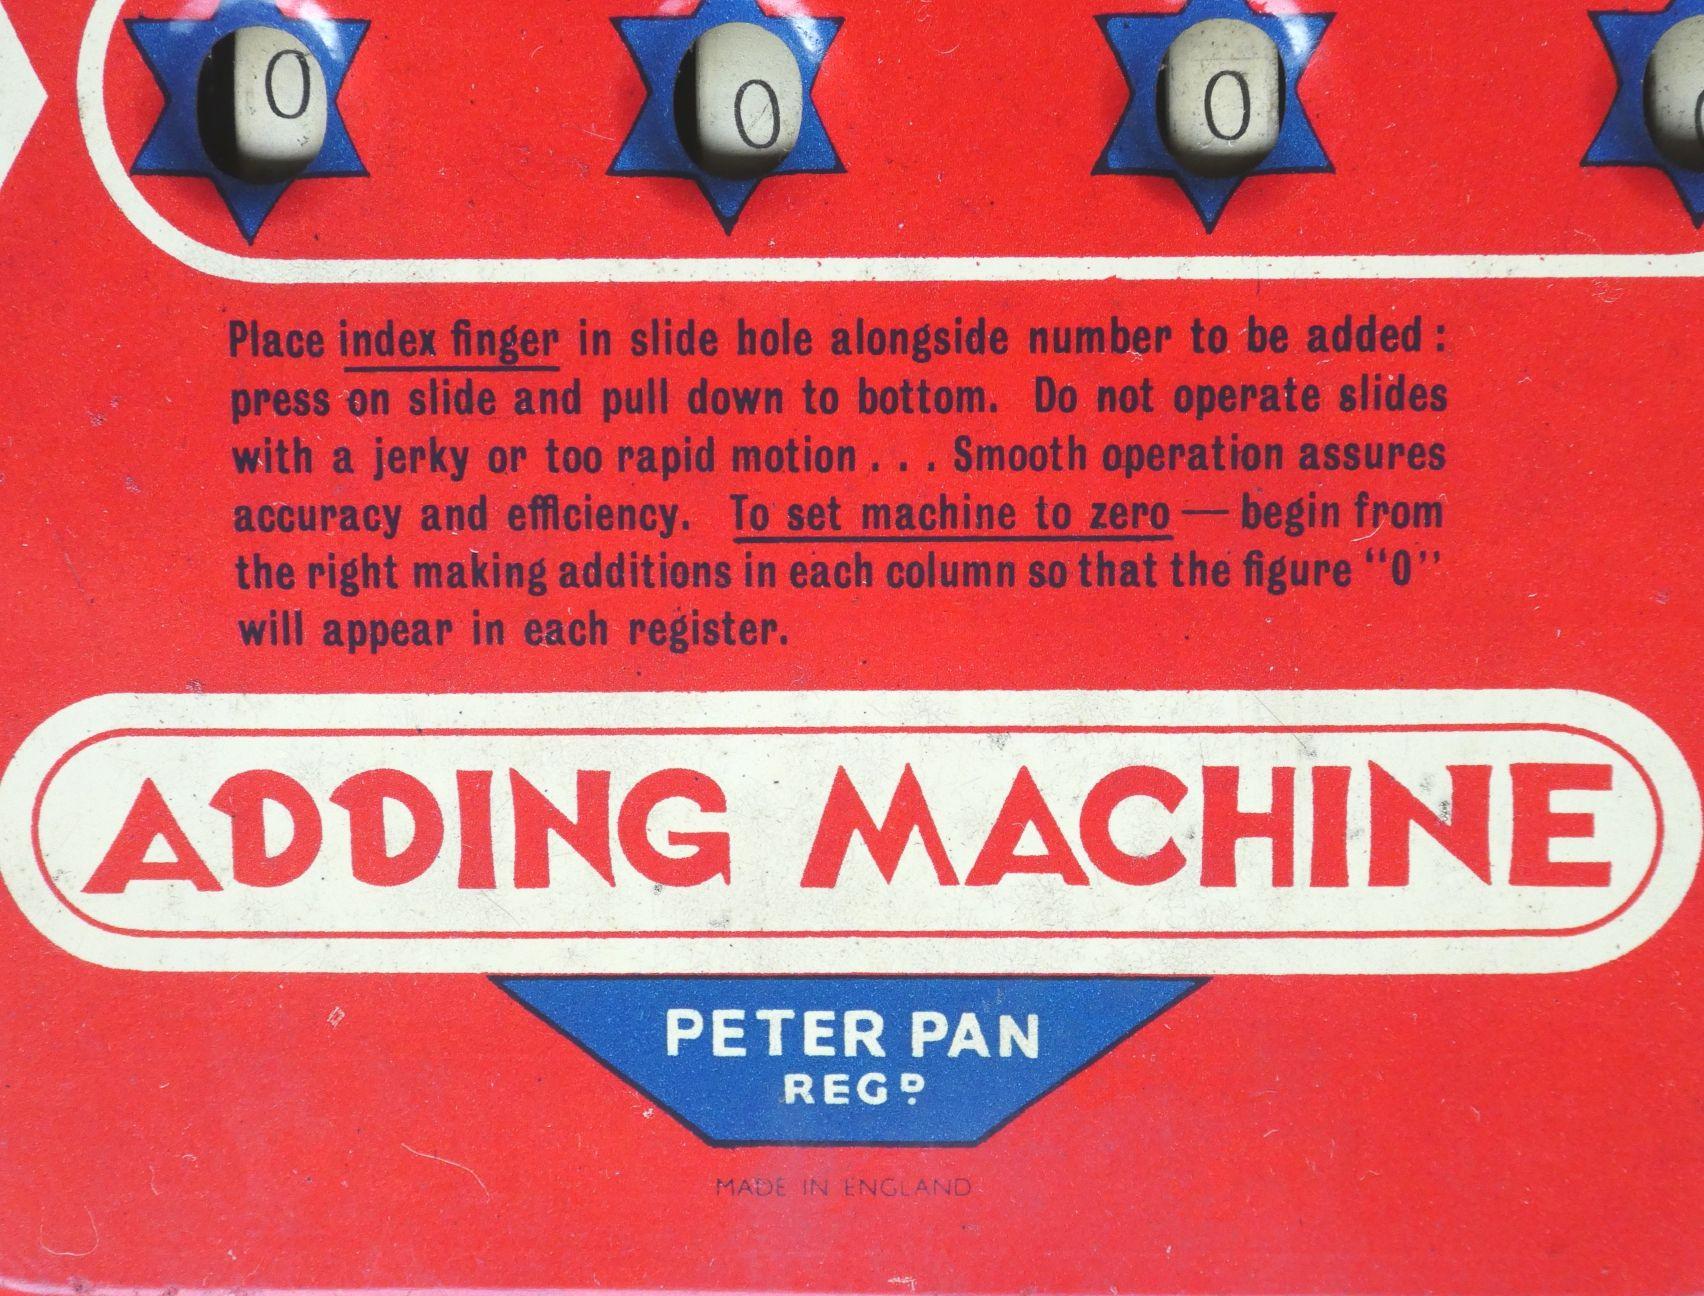 Peter Pan Adding Machine - Jaap's Mechanical Calculators Page